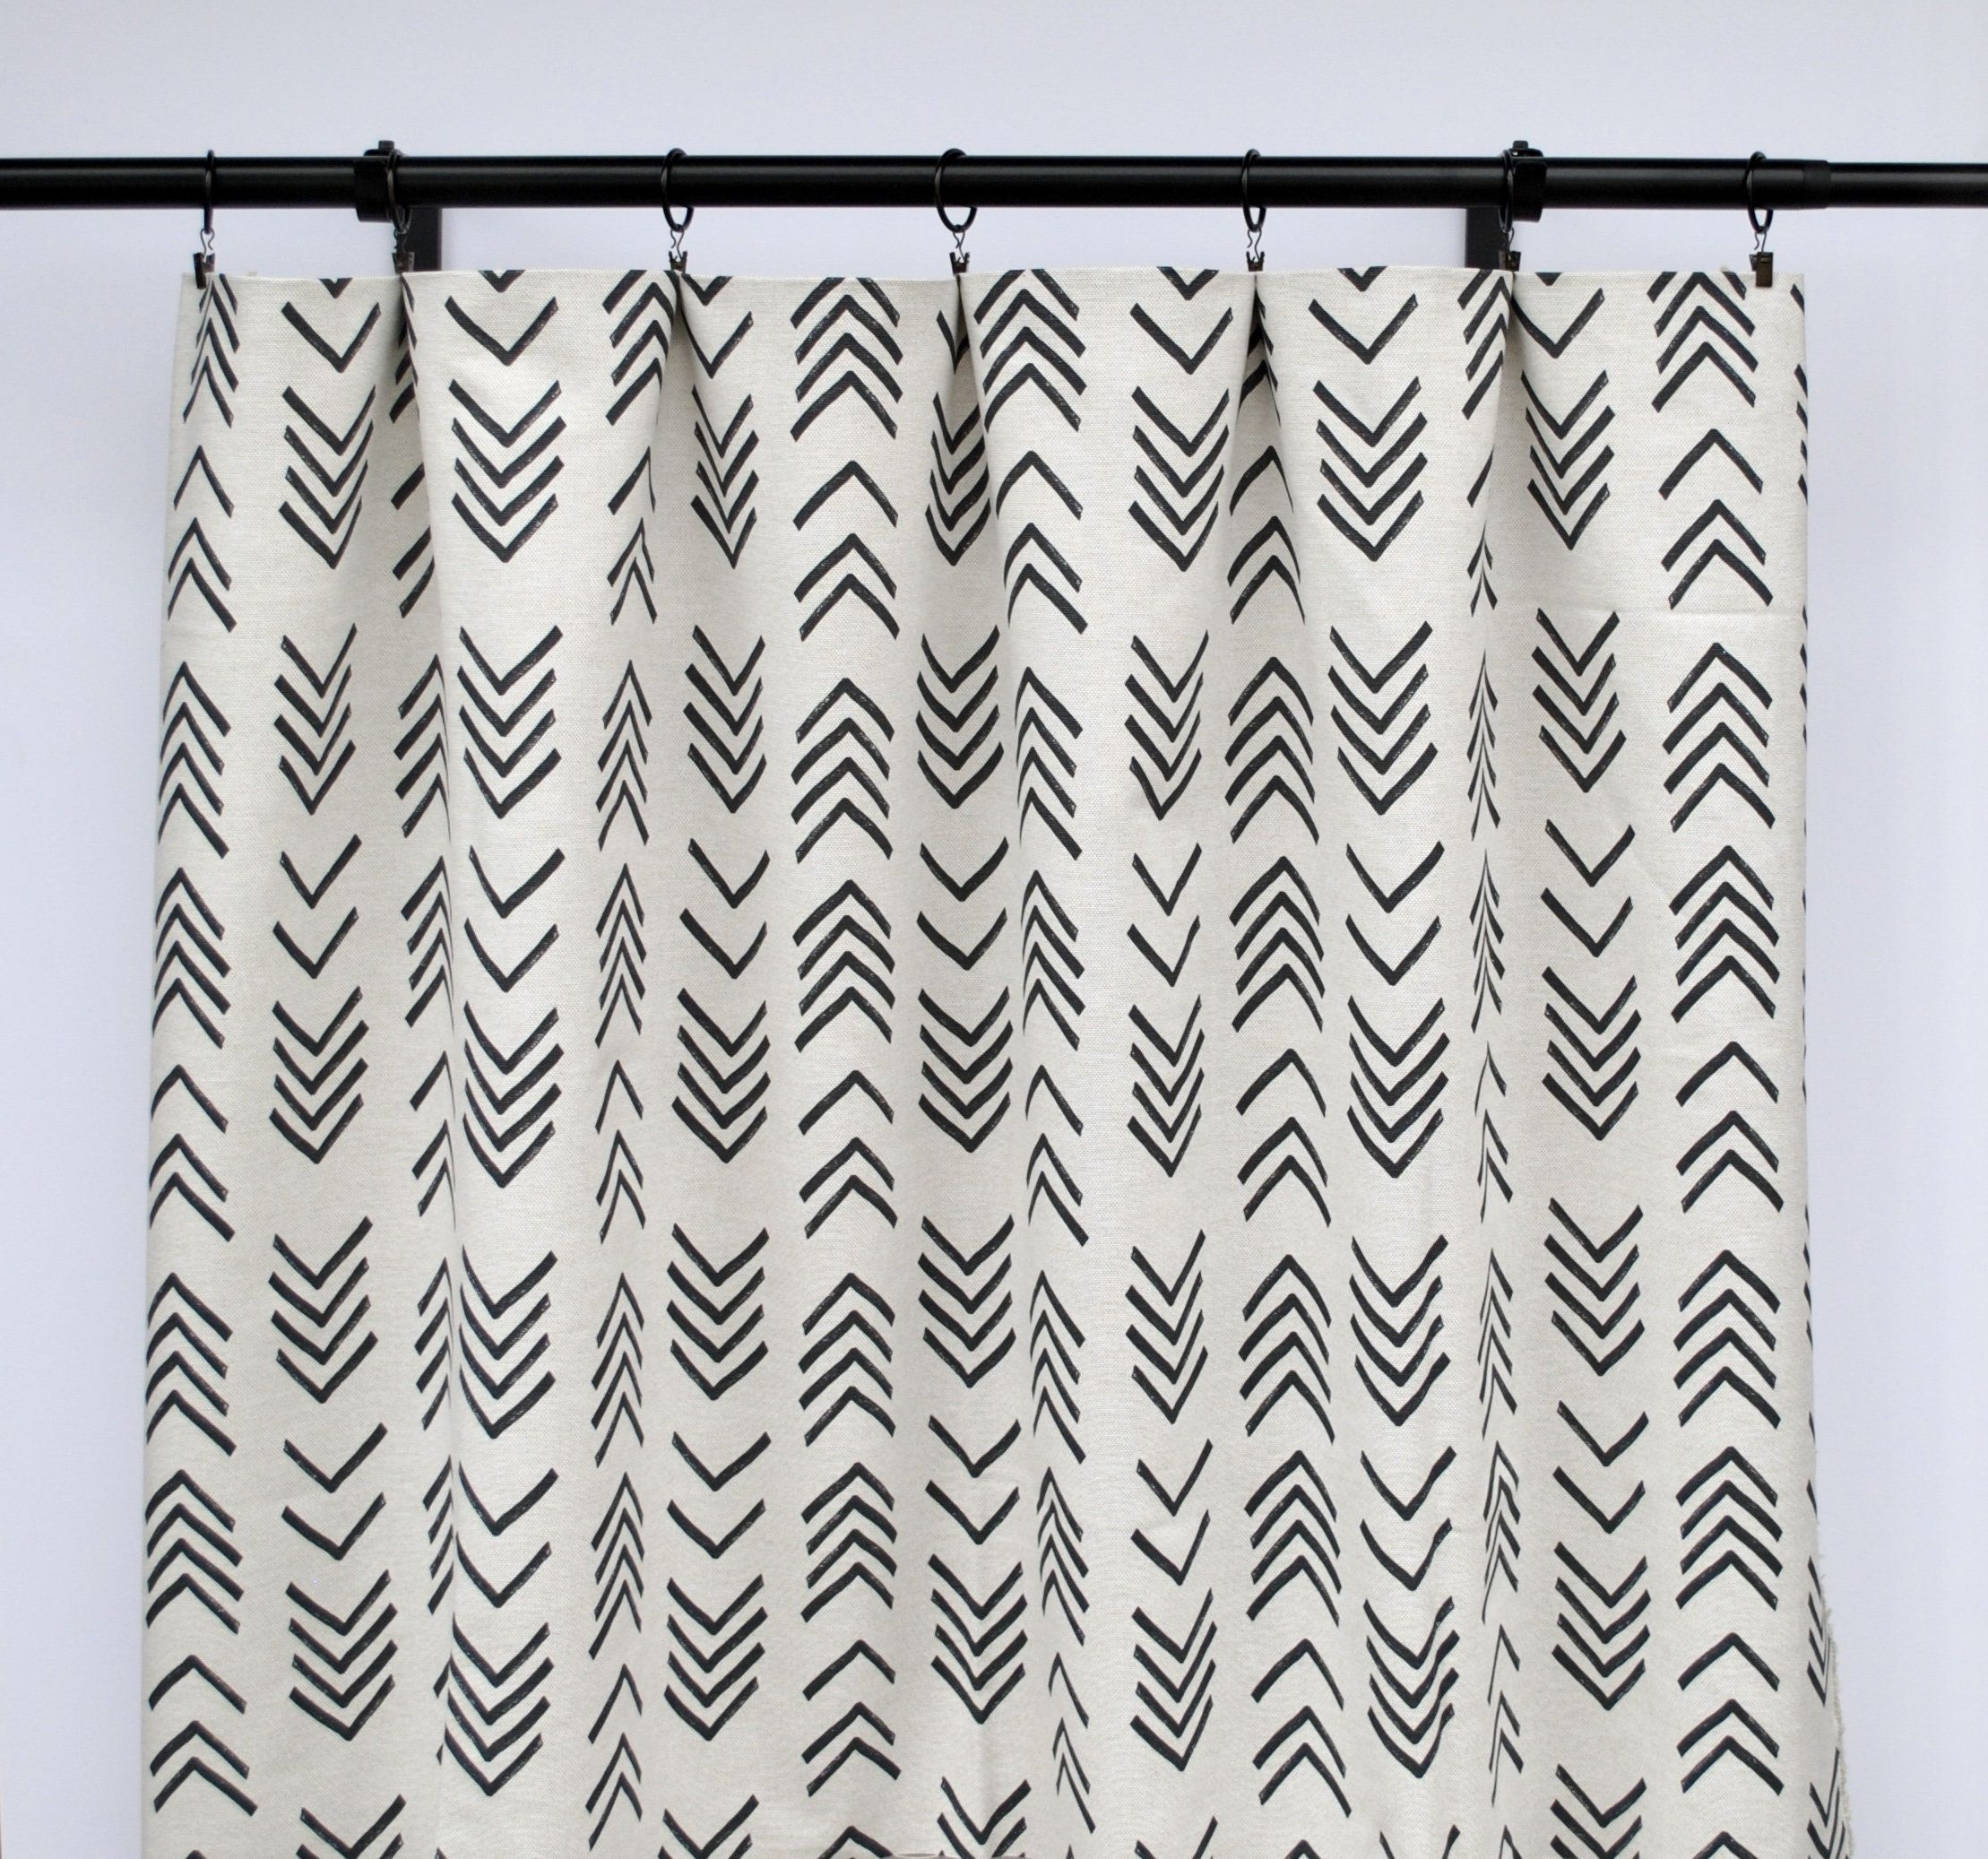 Boho Mud Cloth Curtain Panels Black And White Curtain Panels Mud Cloth Curtains Home Decor Mid Century Curtain Azteca Arrow White Curtains Black Curtains Curtains